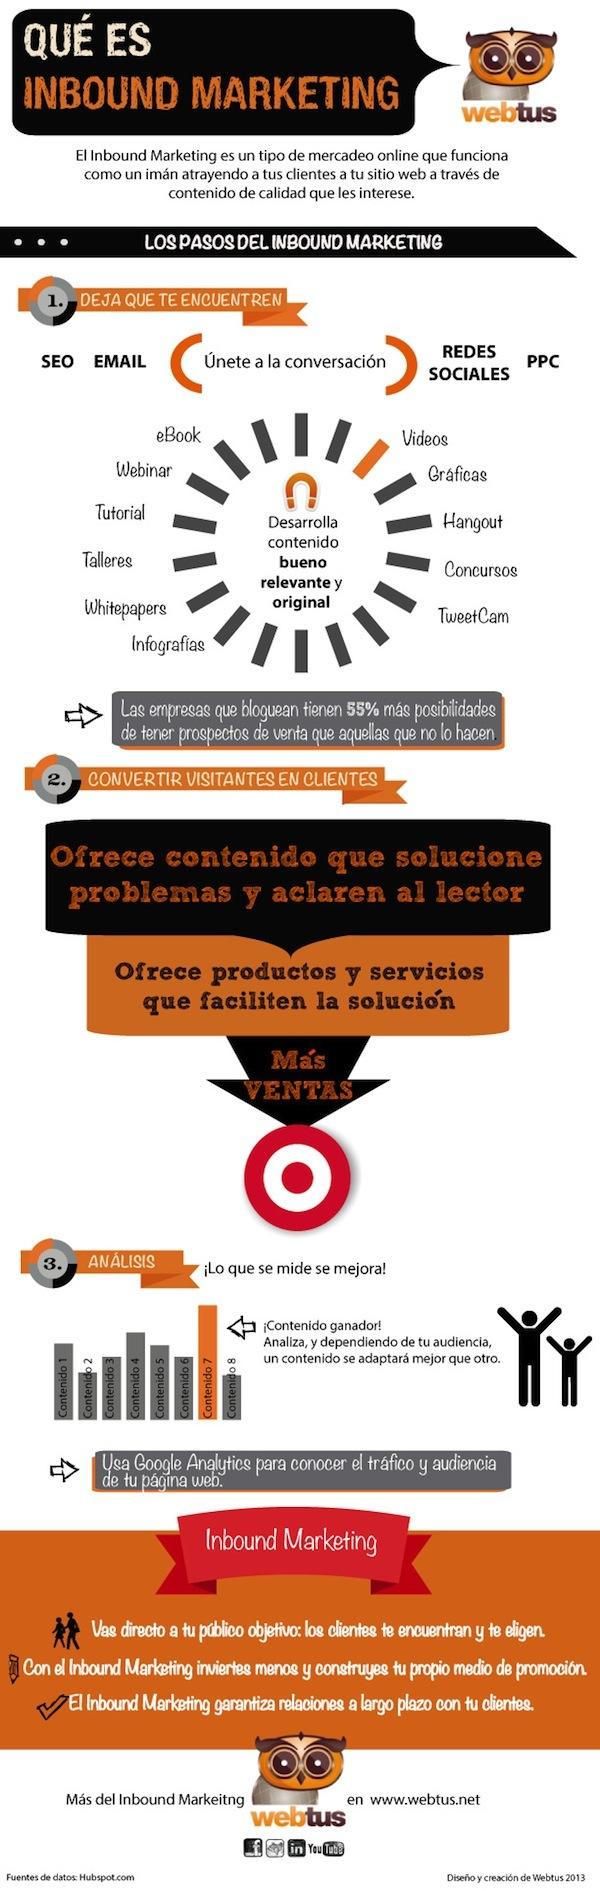 http://www.conectasocialmedia.com/que-es-el-inbound-marketing-infografia-de-la-semana/